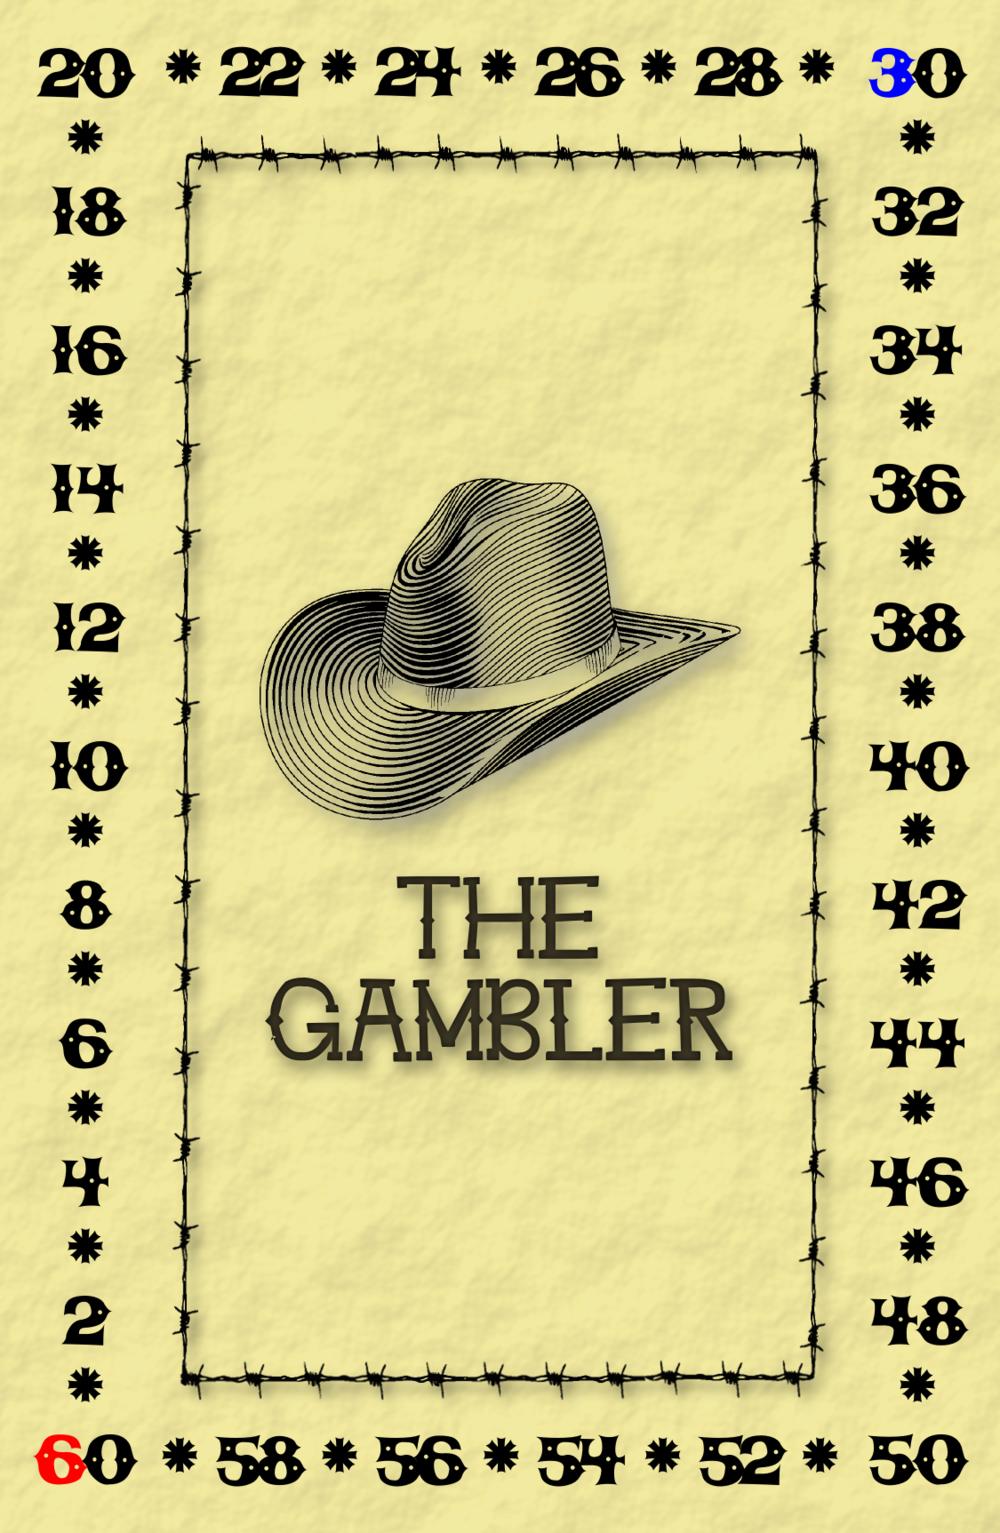 Score Card-Gambler.png